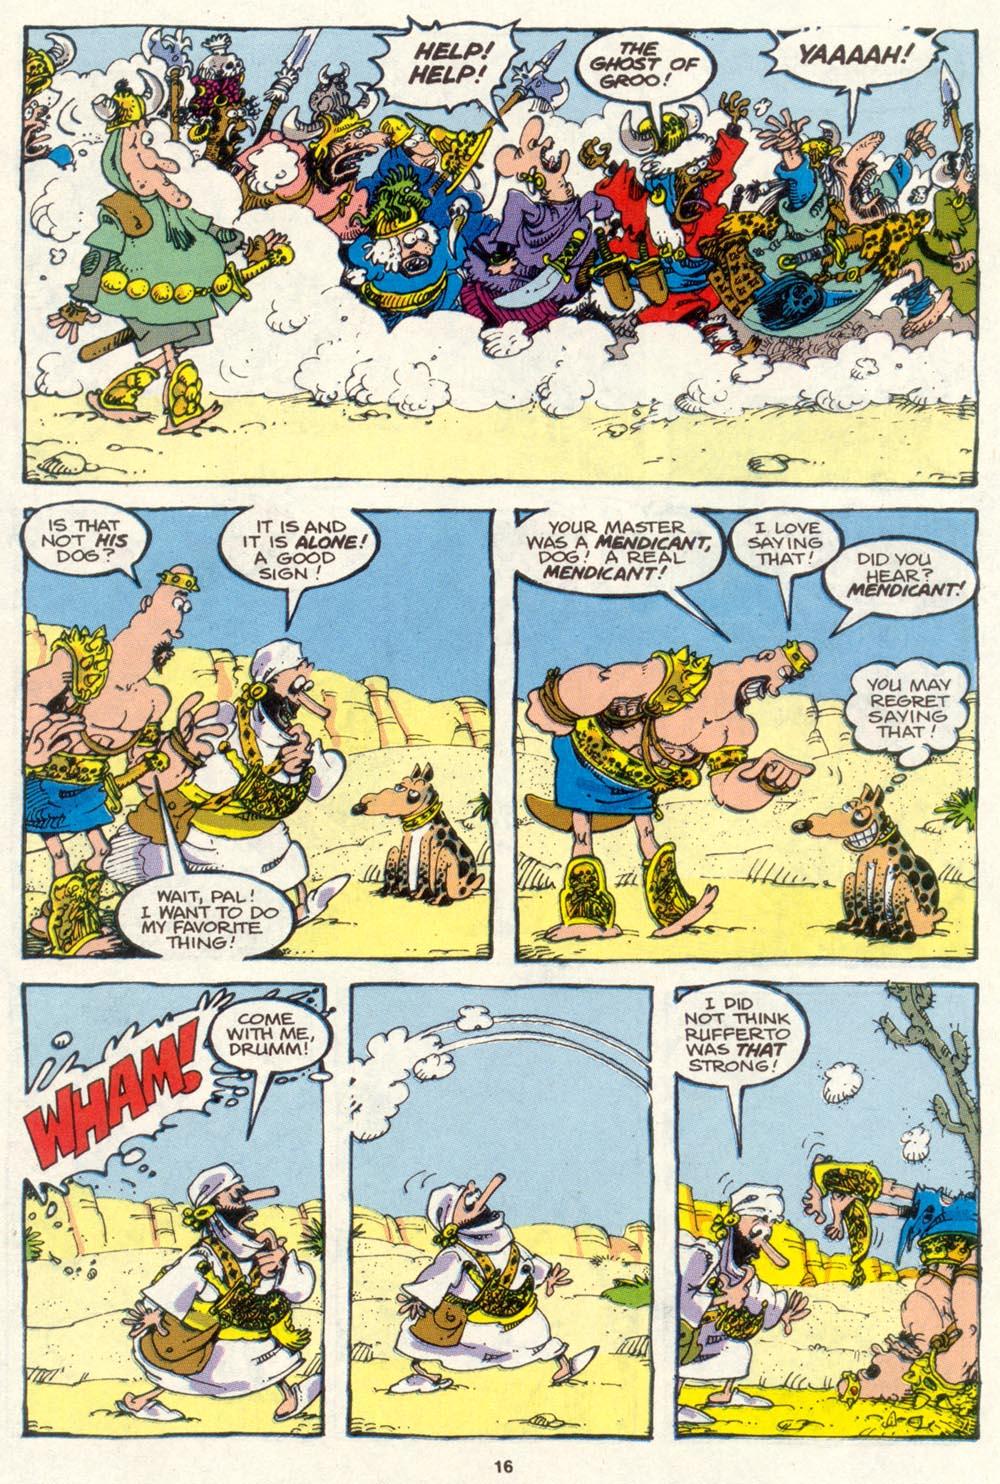 Read online Sergio Aragonés Groo the Wanderer comic -  Issue #85 - 13